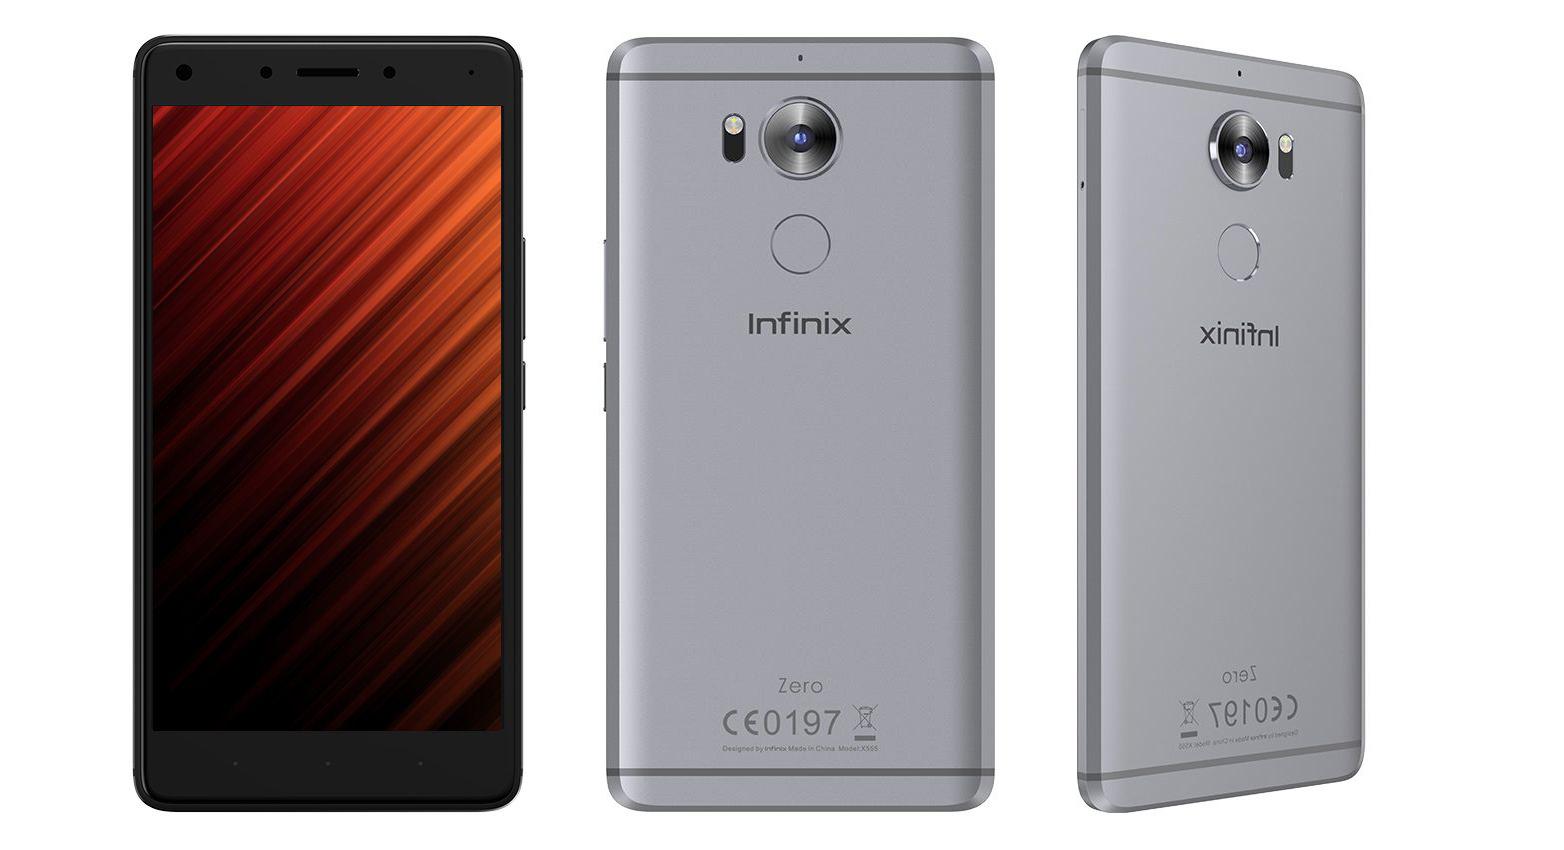 Infinix Zero 4, Spesifikasi dan Harga Terkini